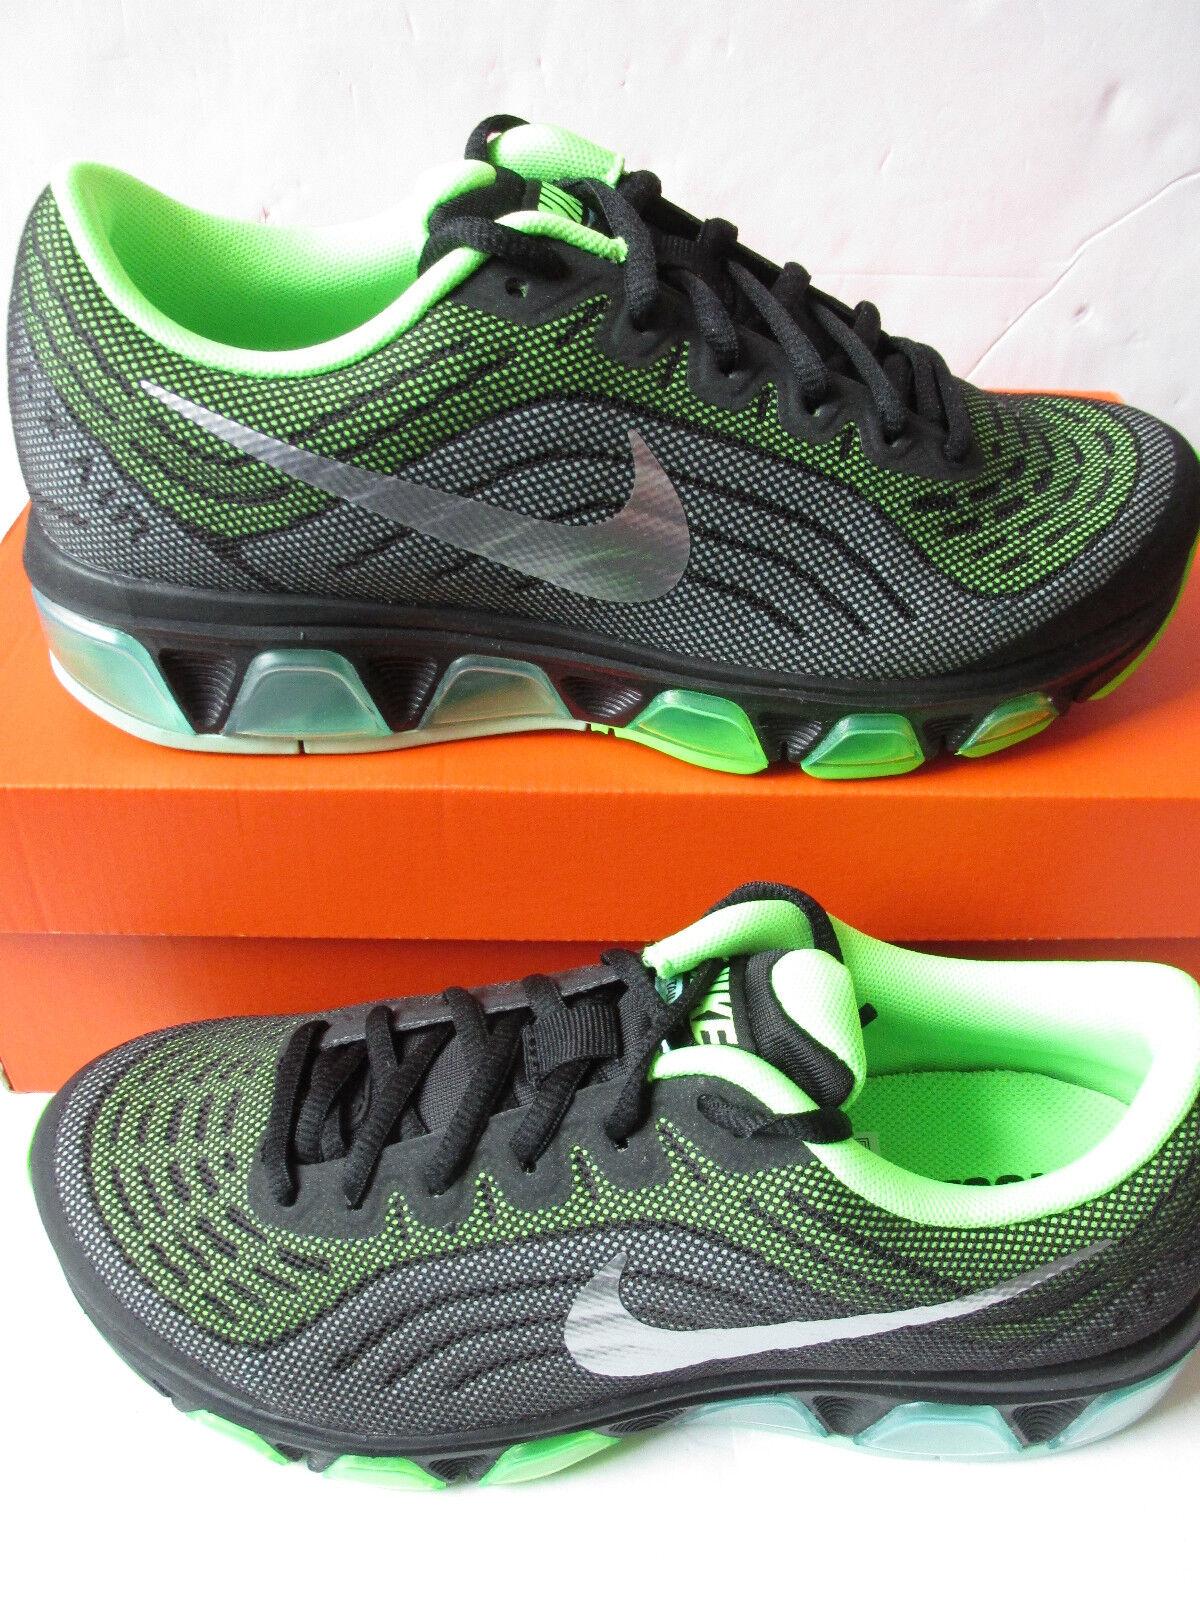 Nike Donna Air Max Tailwind 6 Scarpe da Corsa 621226 001 Scarpe da Tennis